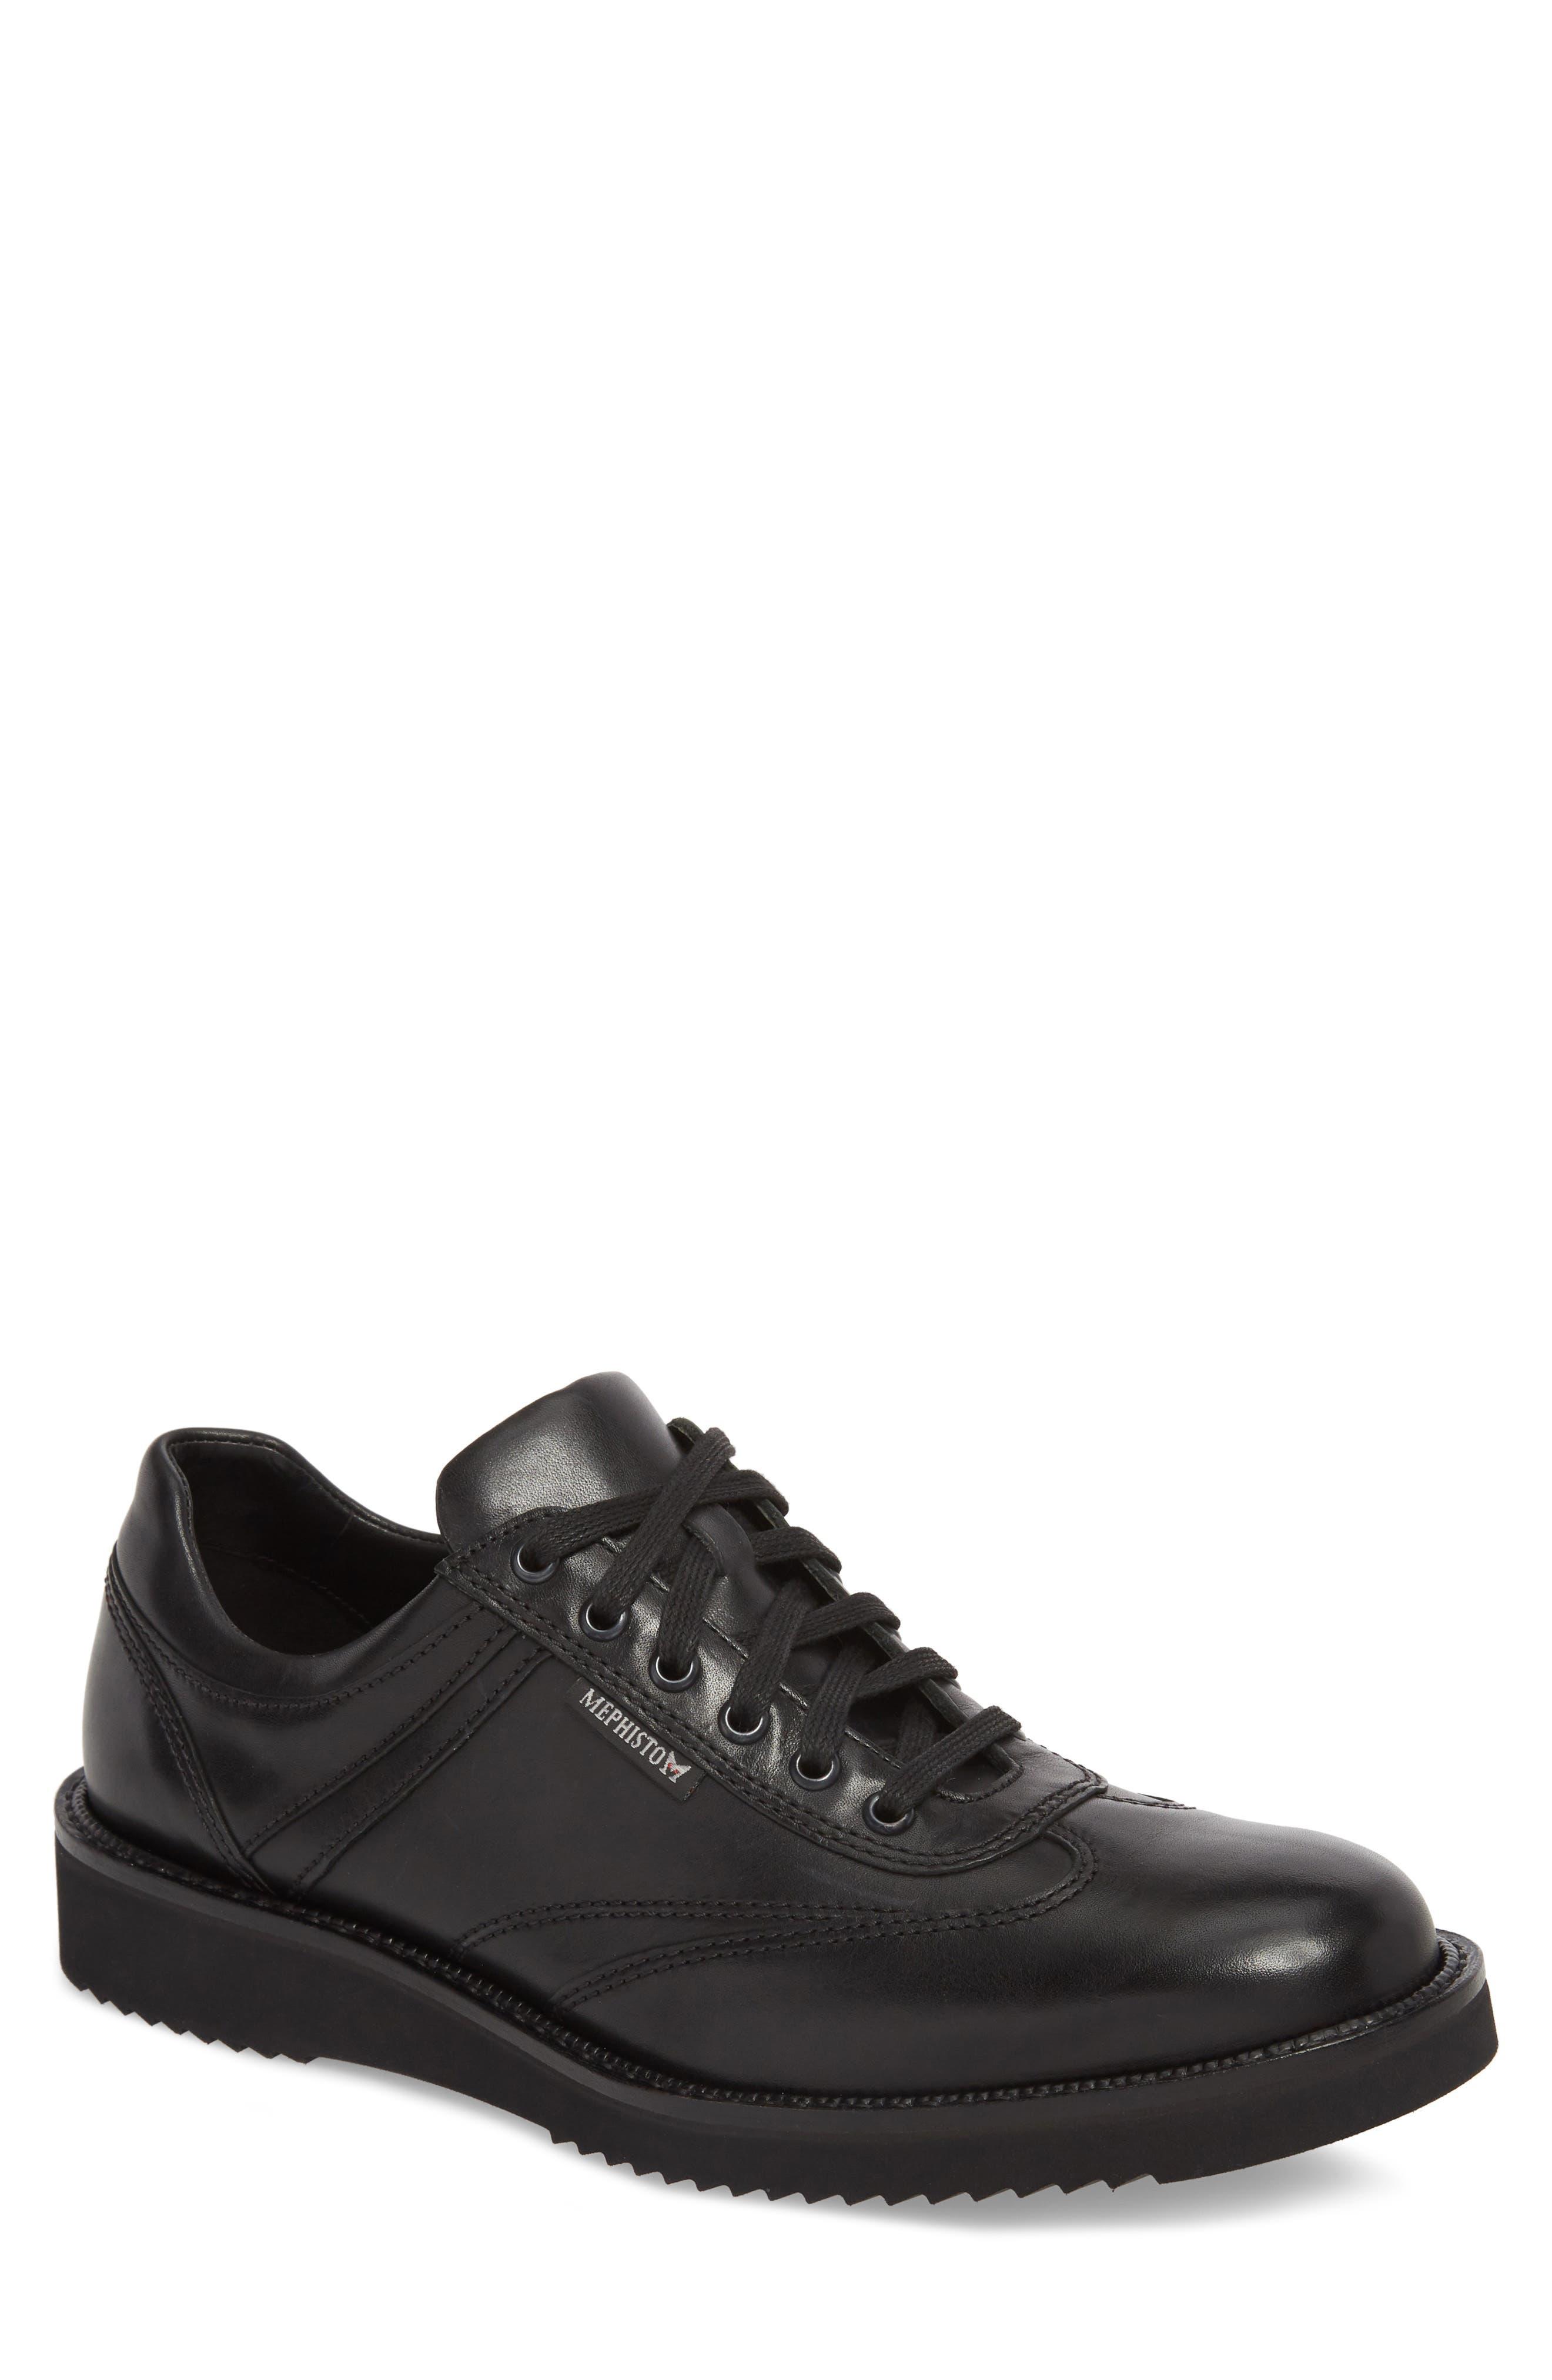 Adriano Sneaker,                         Main,                         color, 001